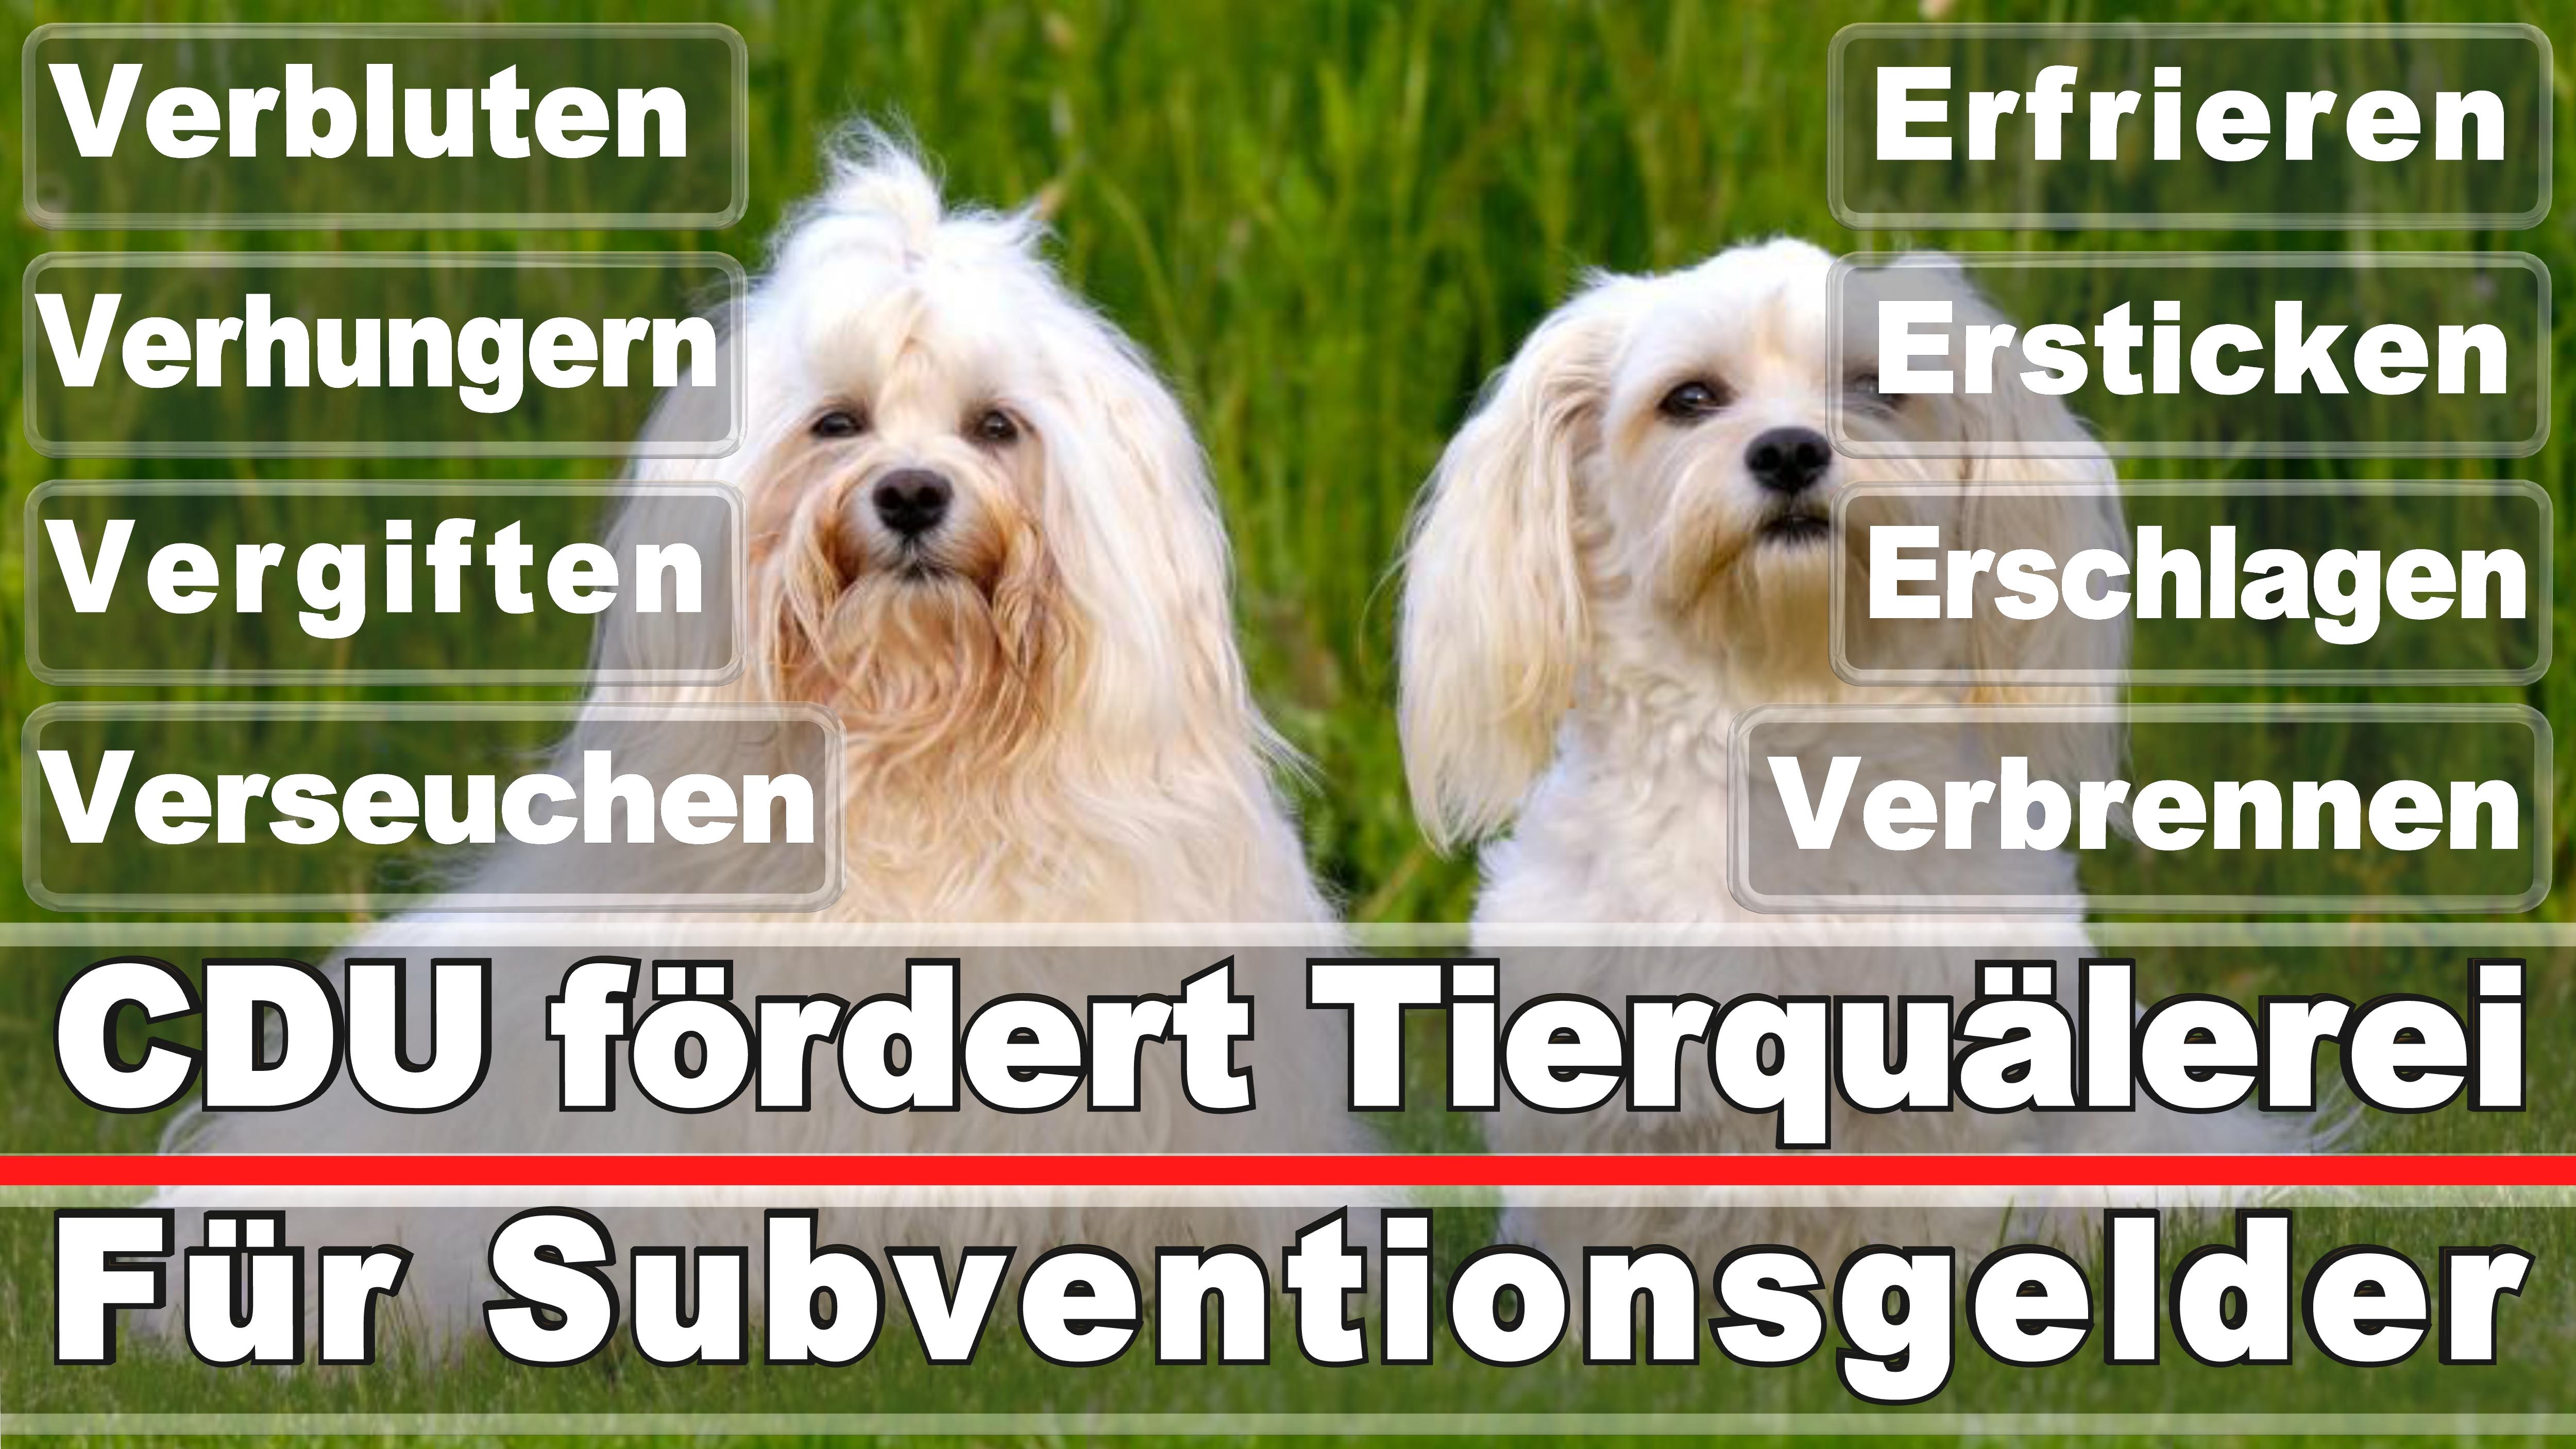 Landtagswahl-Bundestagswahl-CDU-SPD-FDP-AFD-Linke-Piraten-Tierschutzpartei (42)